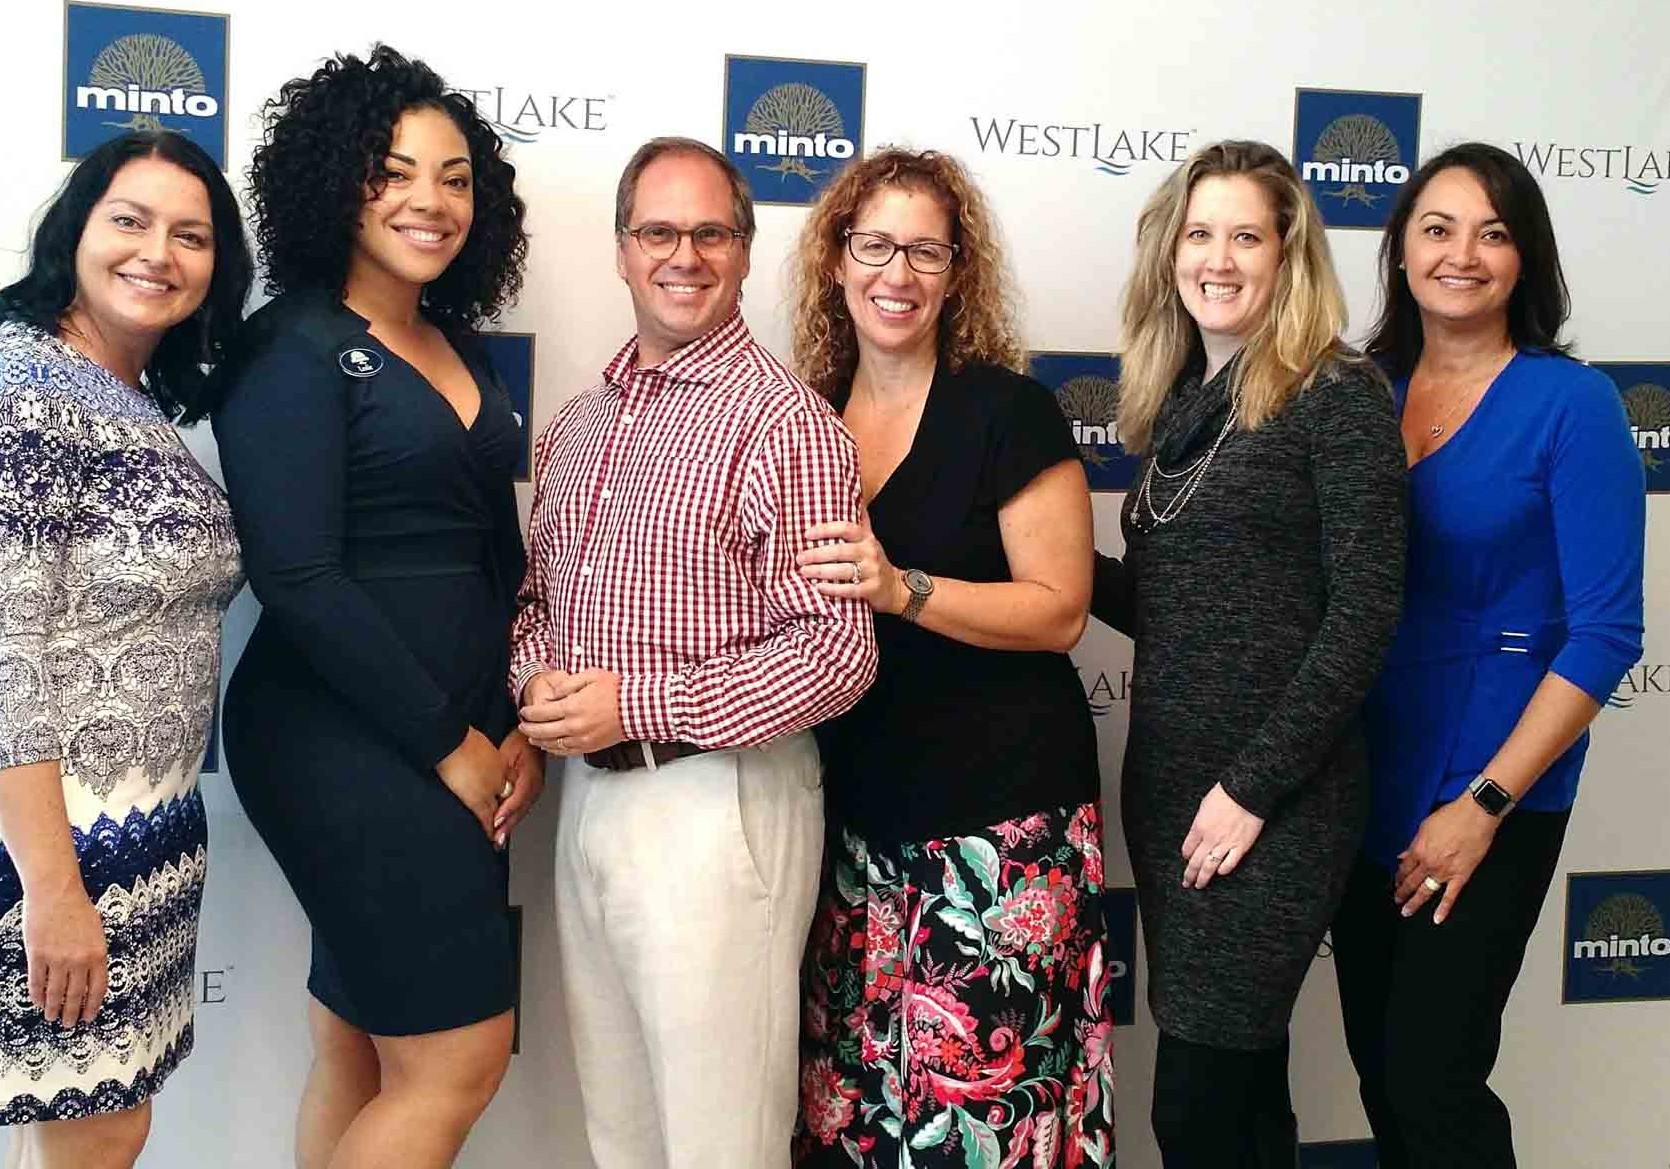 Westlake event Leslie, Sandra, Tanya, REACH